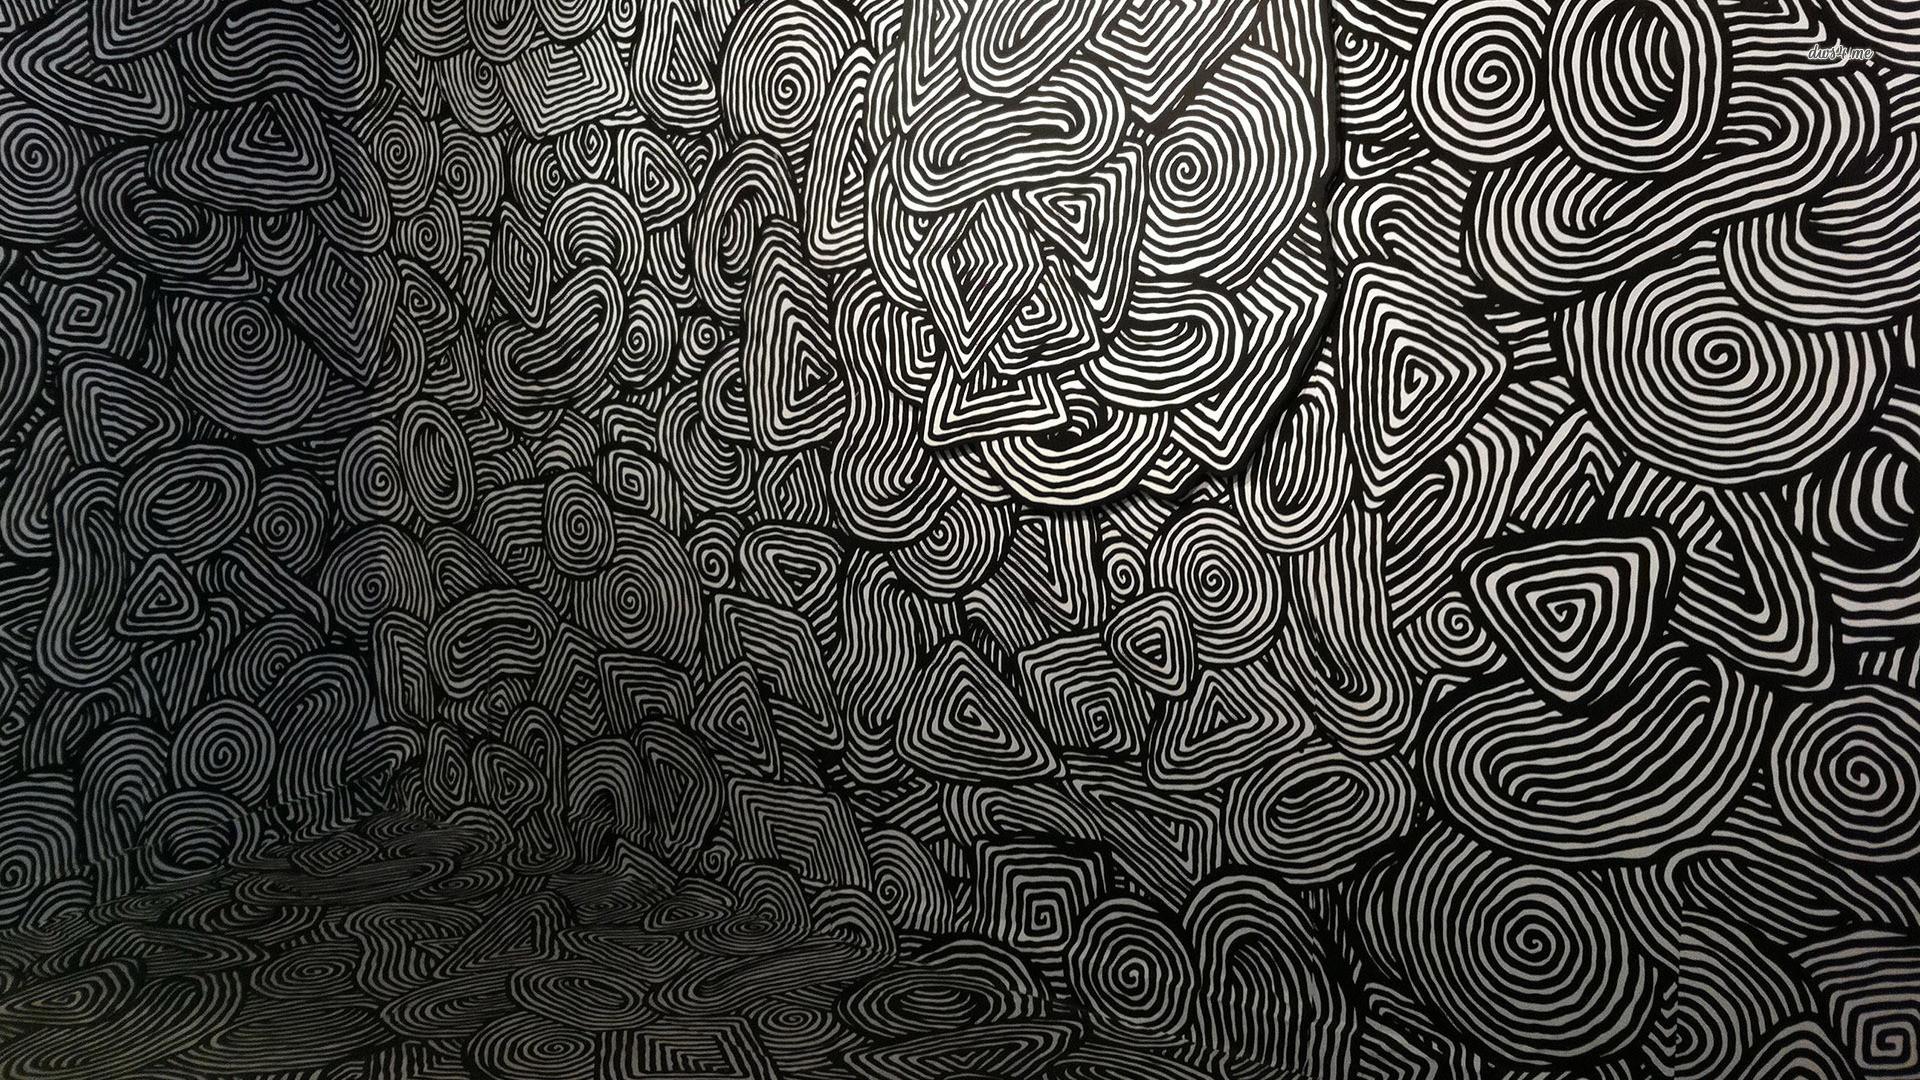 Psychedelic Desktop Wallpaper HD – dlwallhd.